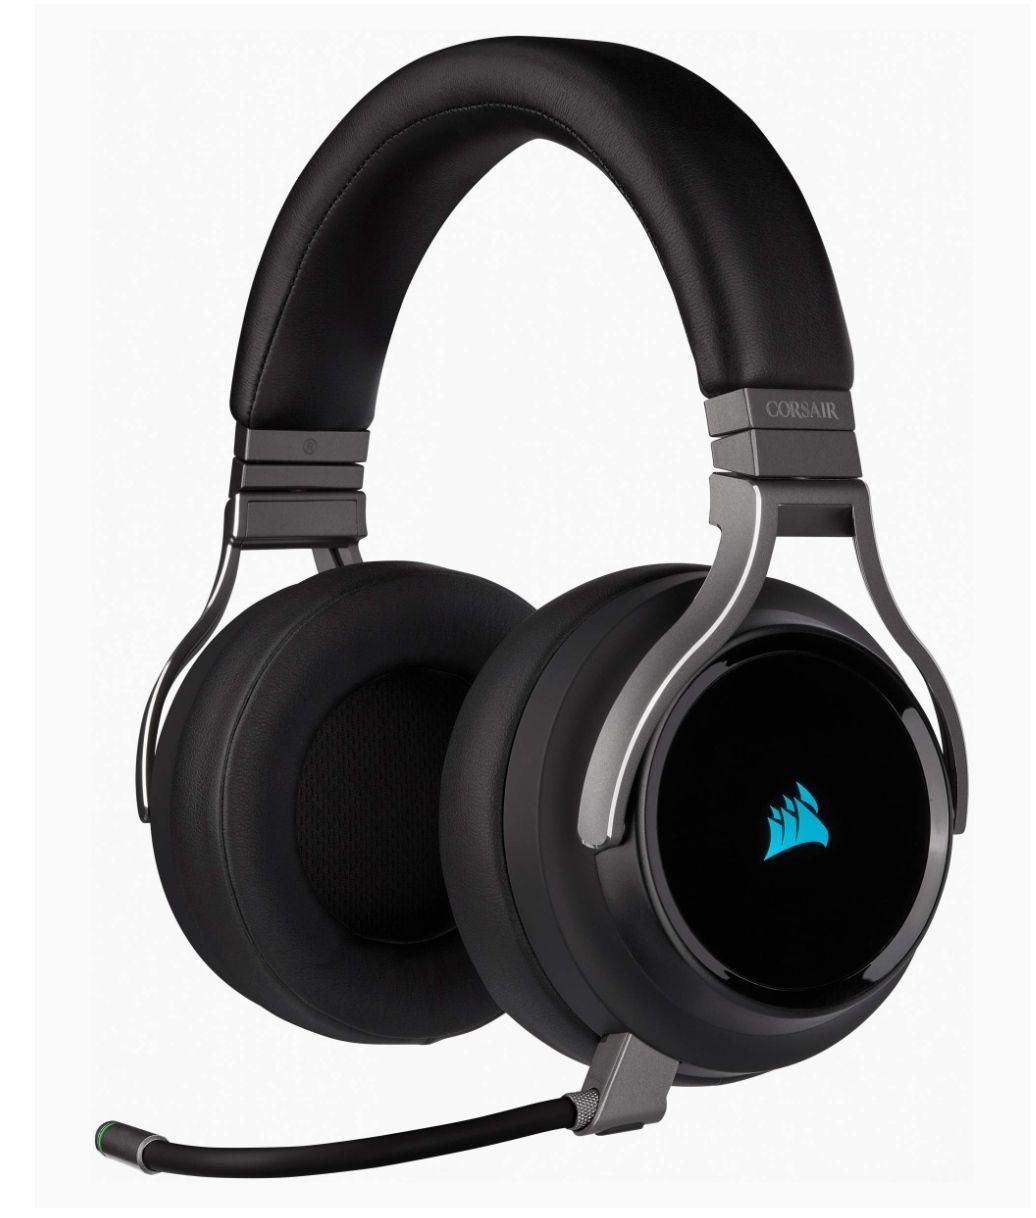 Casque Gaming sans-fil Corsair Virtuoso RGB Wireless - Noir